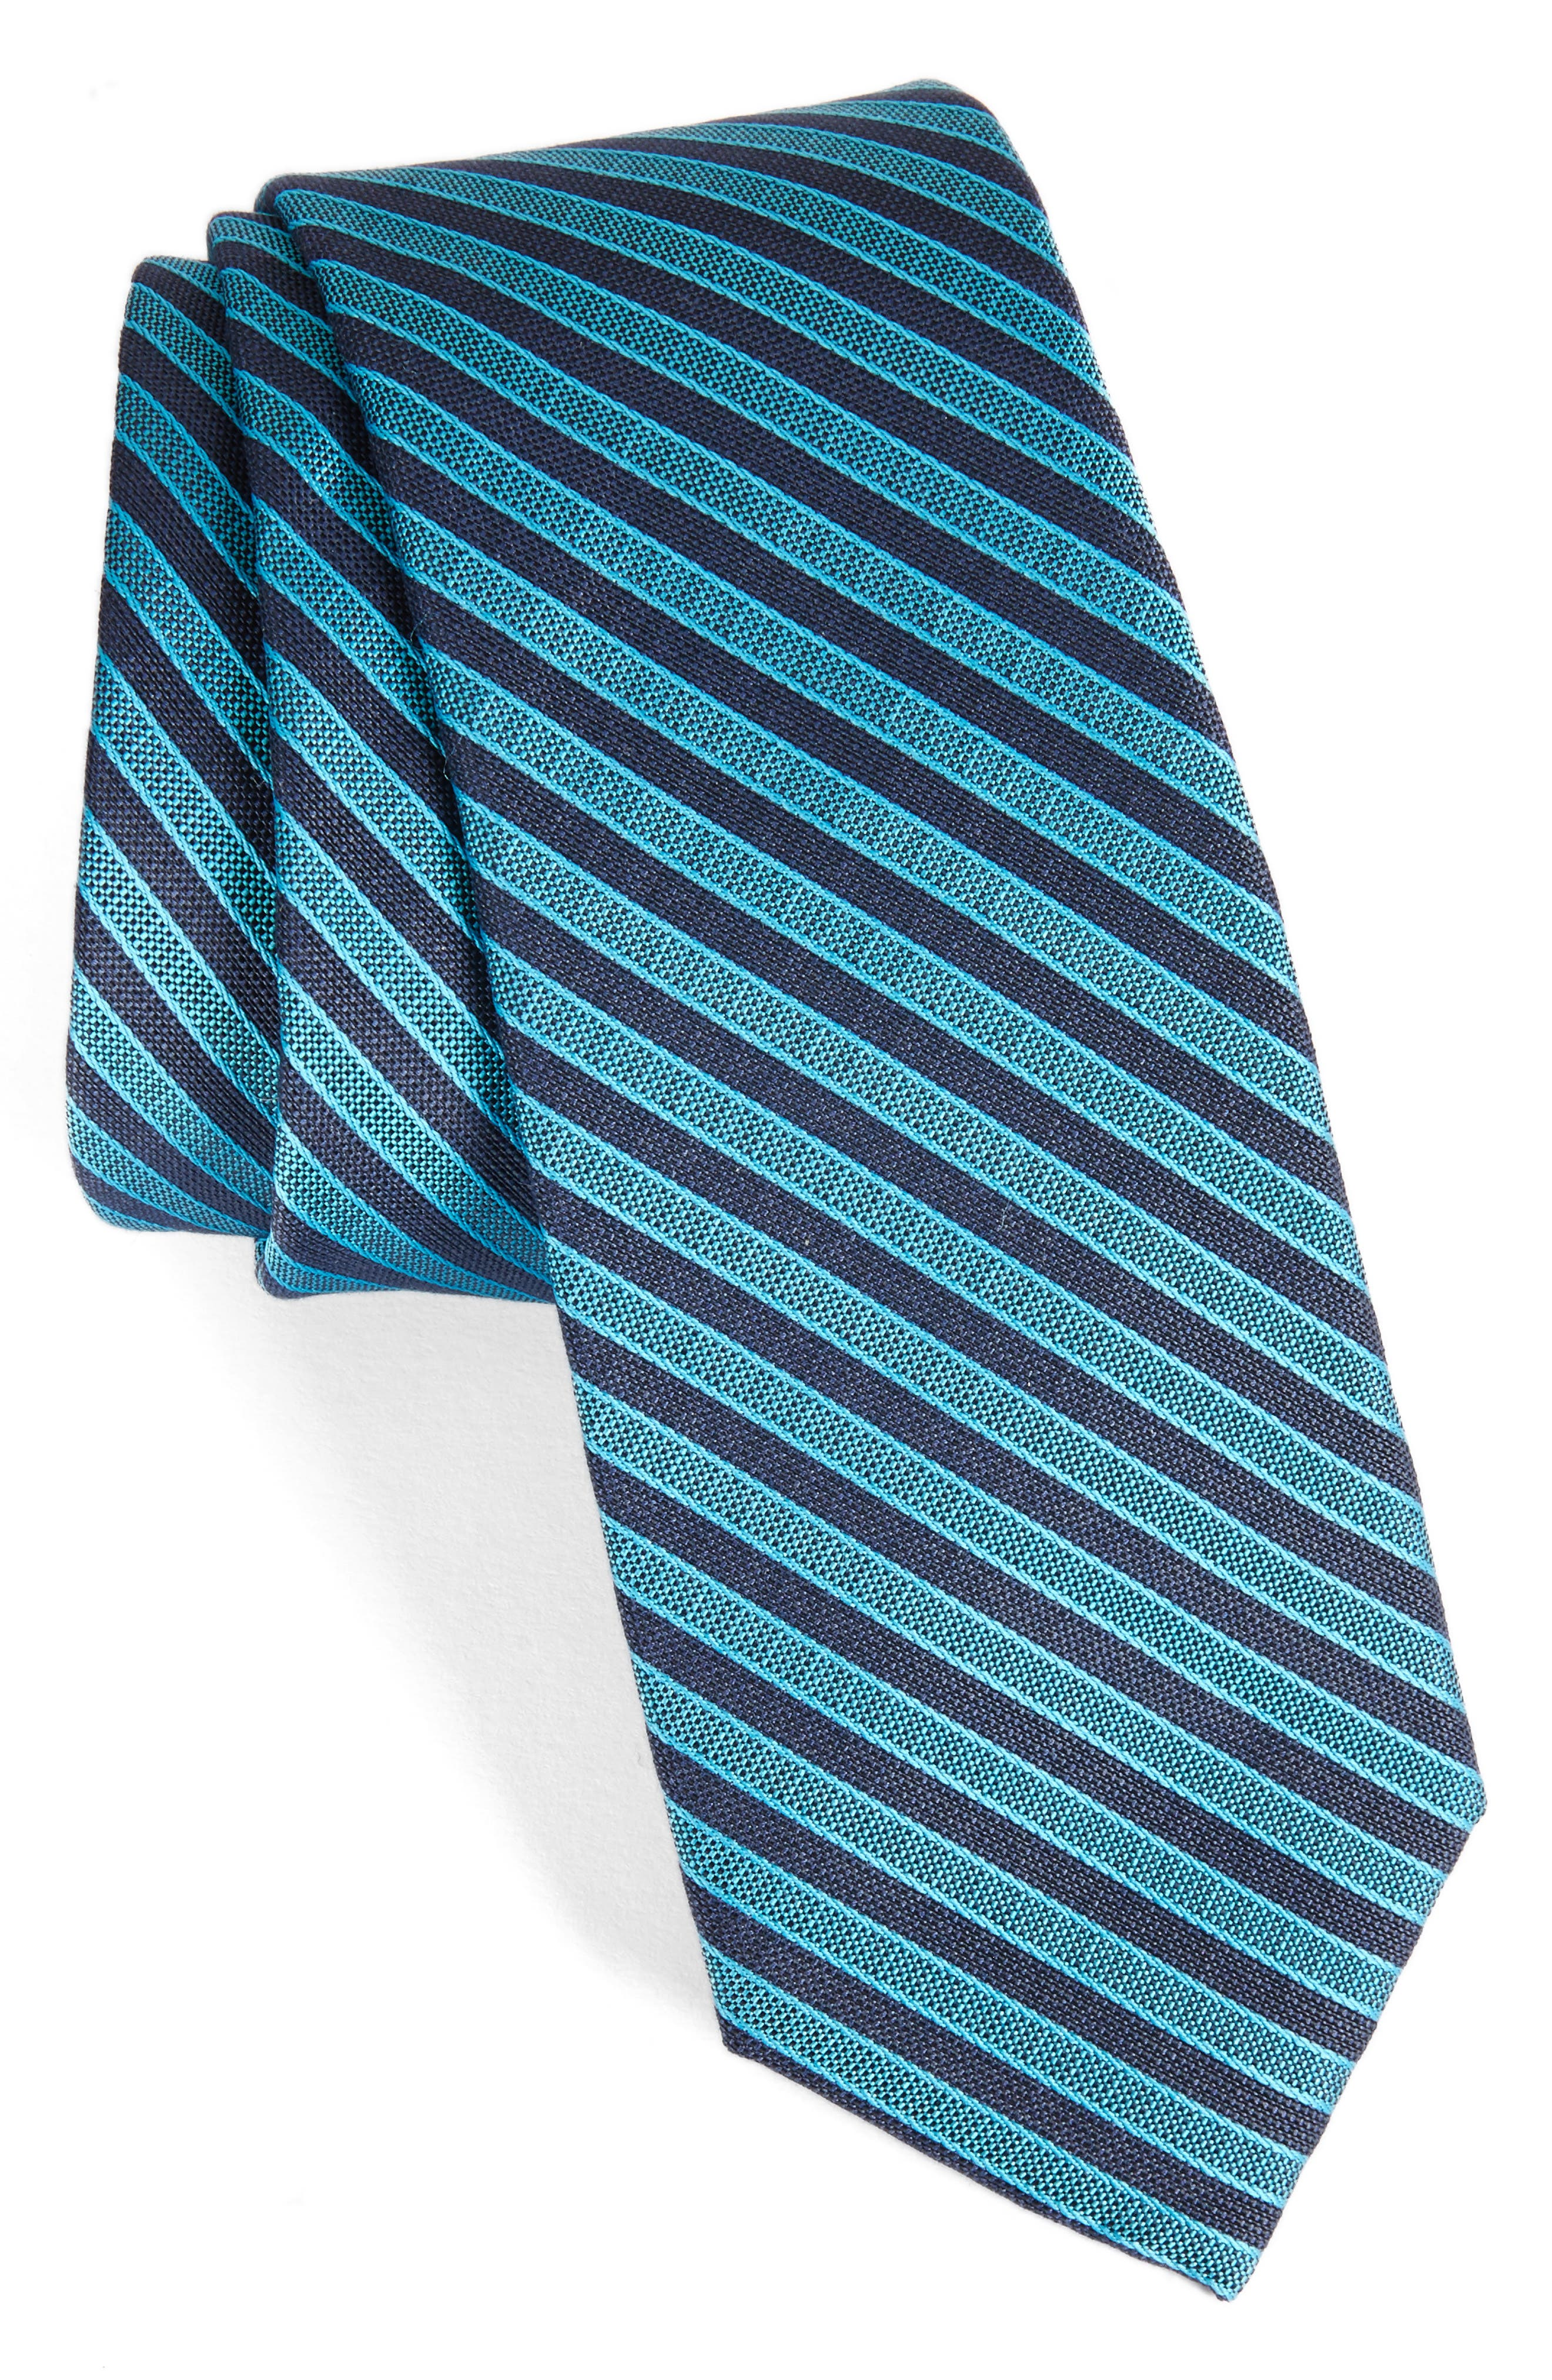 Calibrate Pop Up Stripe Tie